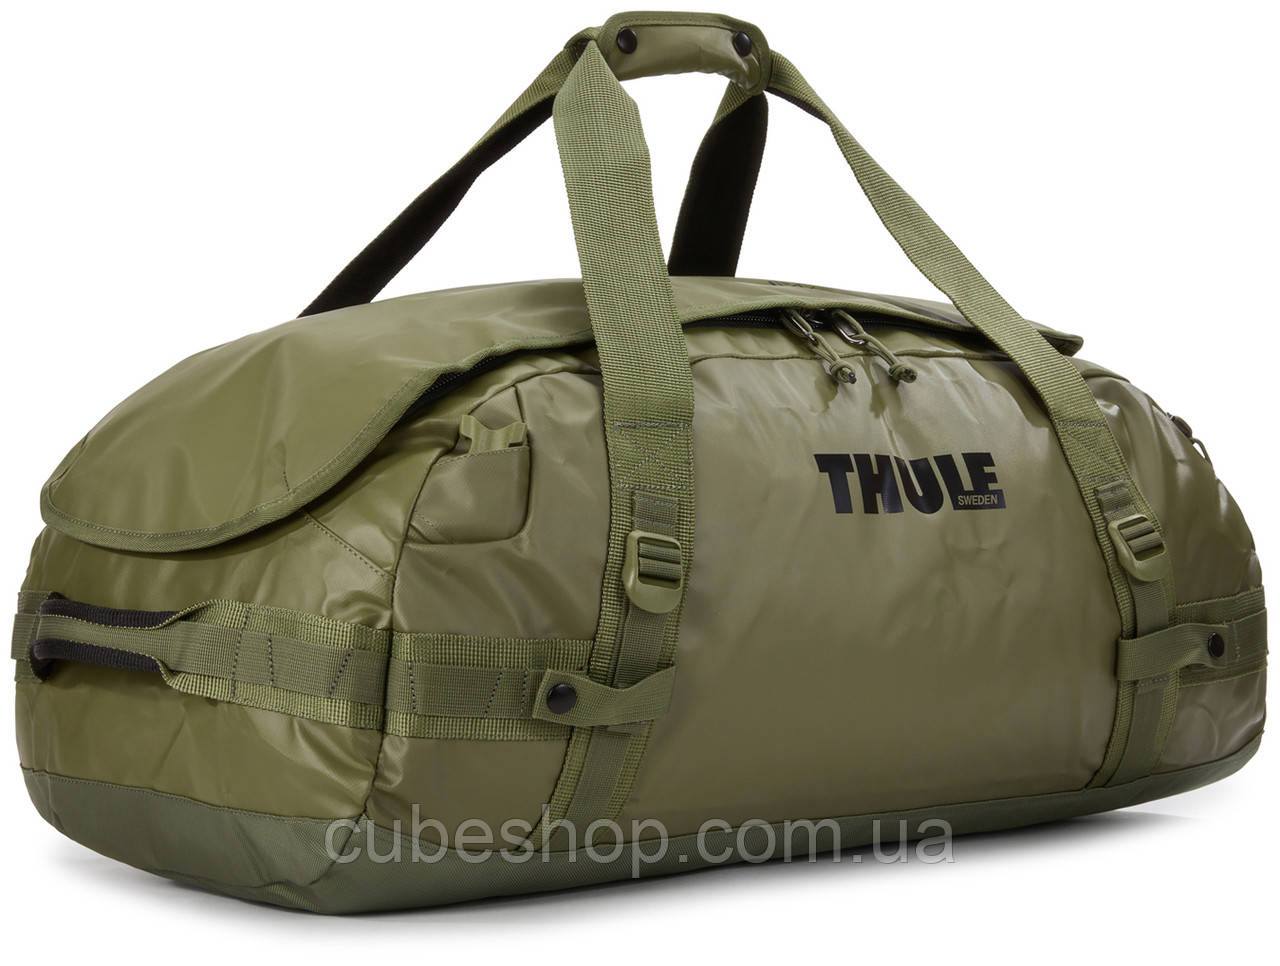 Спортивная сумка-рюкзак Thule Chasm 70L Olivine (оливковый)